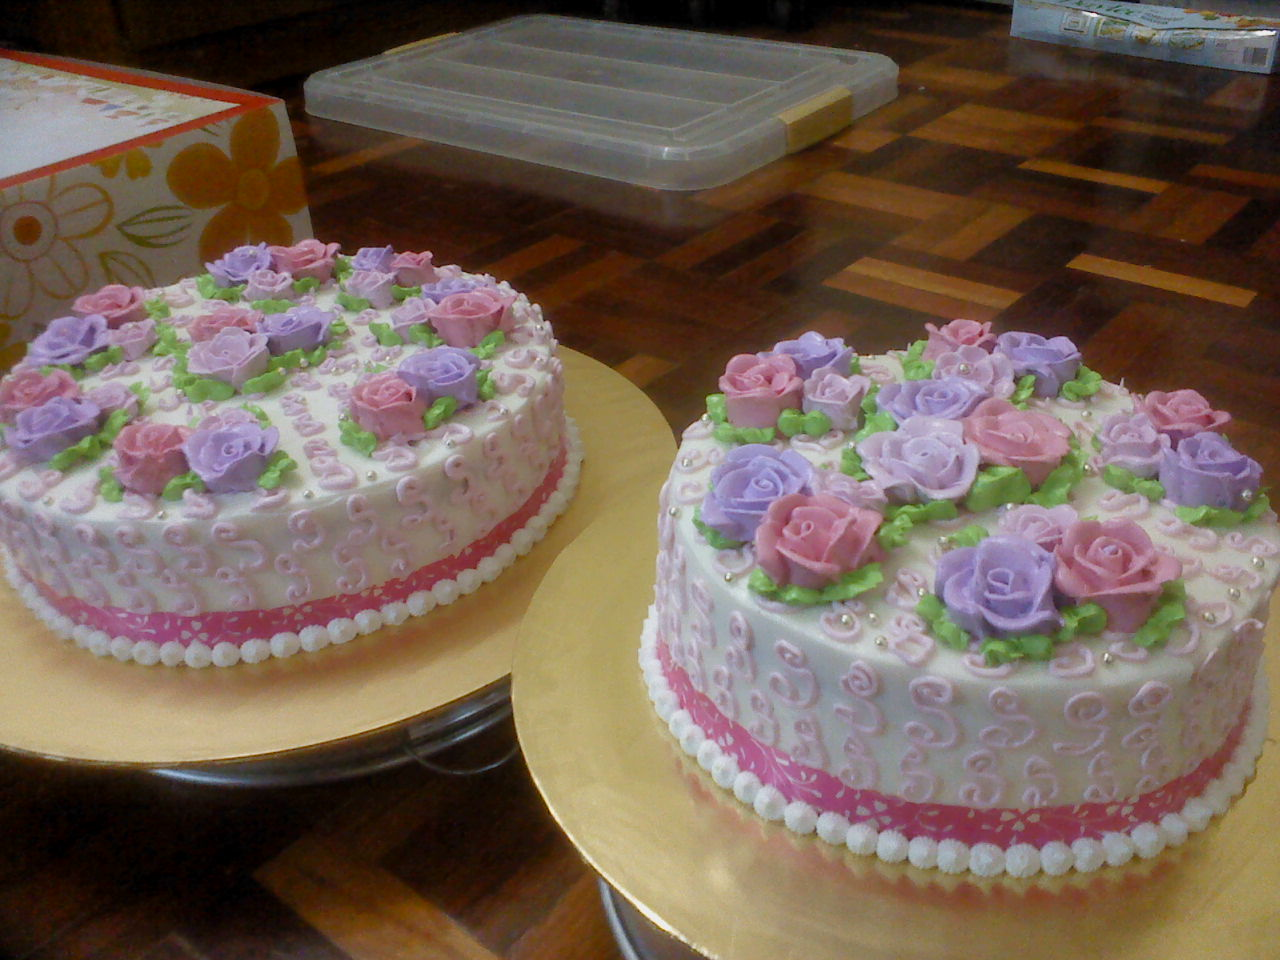 Balqisyia s Choc Shop 2 TIER WEDDING CAKE PINK PURPLE